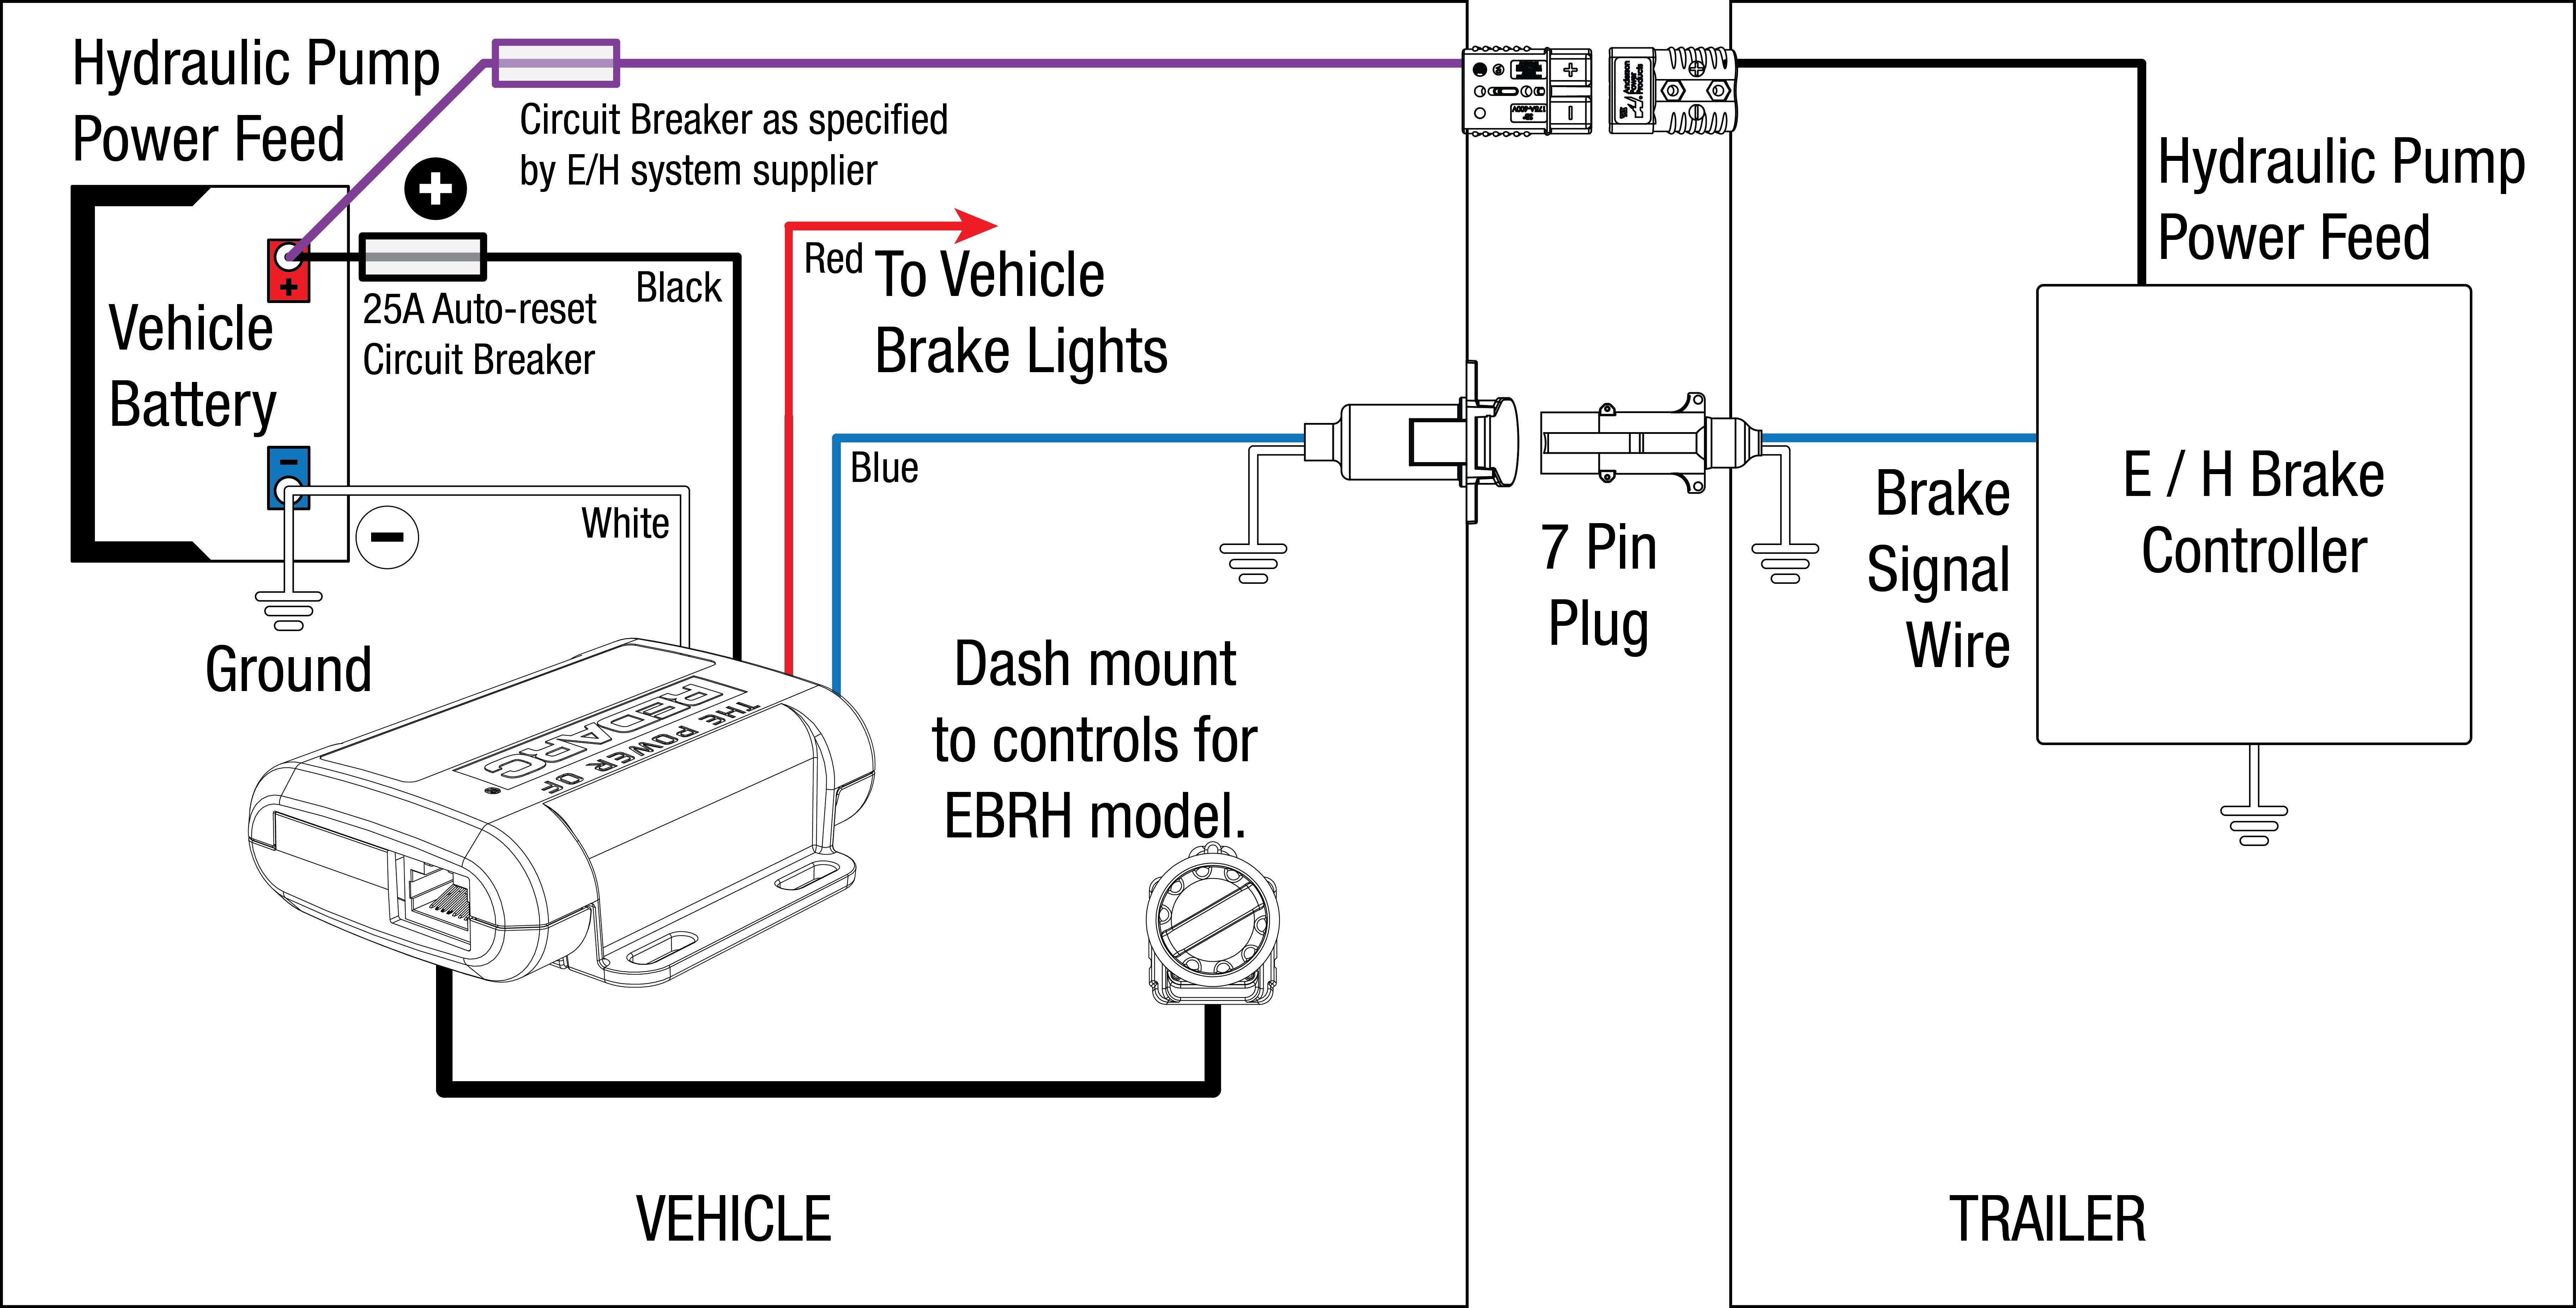 kwikee step wiring diagram 28 list of schematic circuit diagram Kwikee 1802930 Products Wiring Diagram